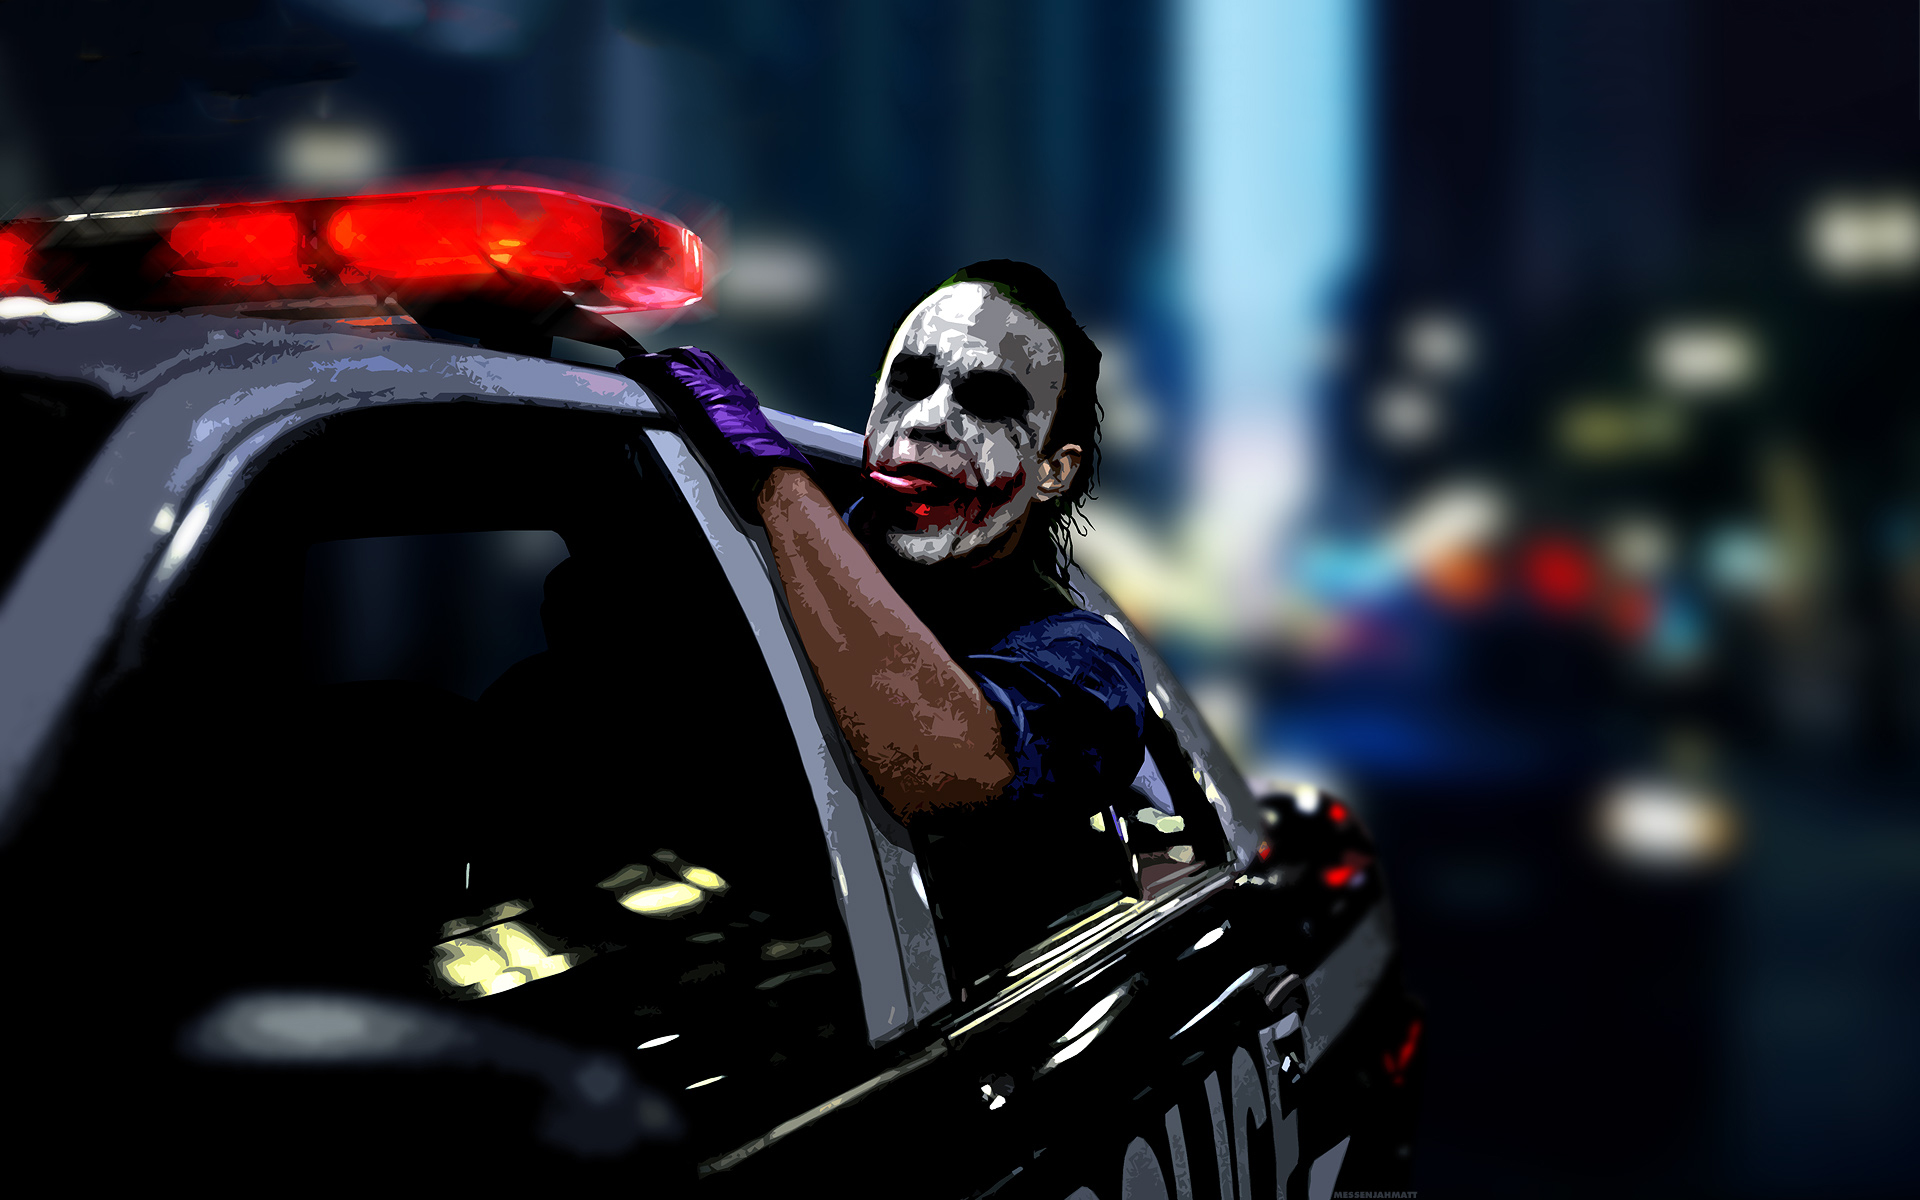 The joker police car